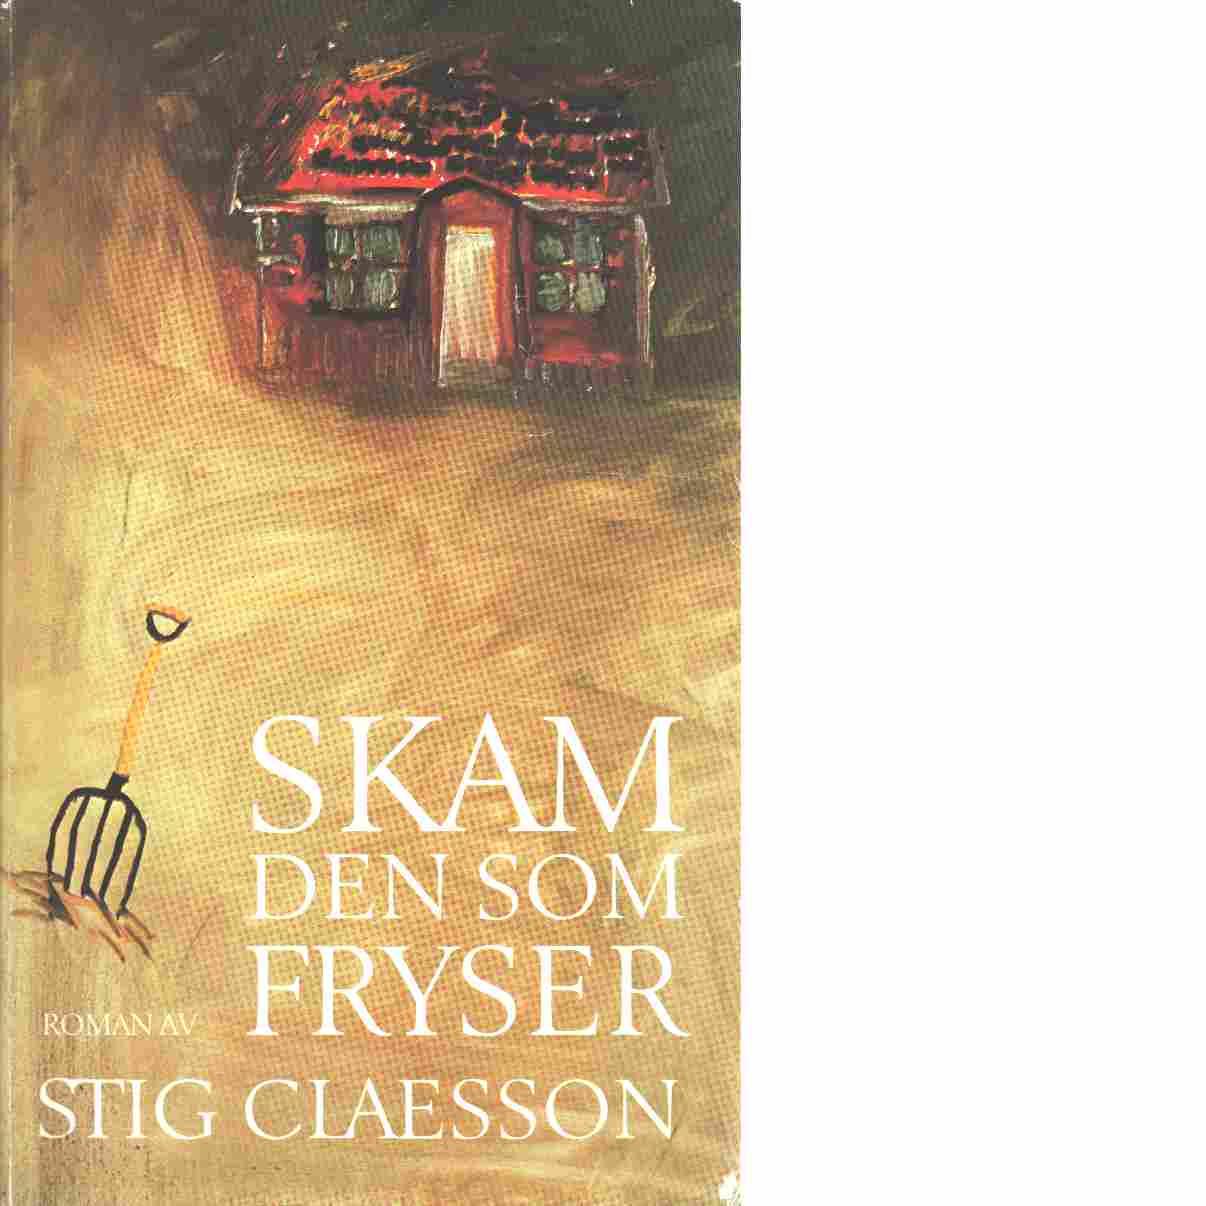 Skam den som fryser - Claesson, Stig